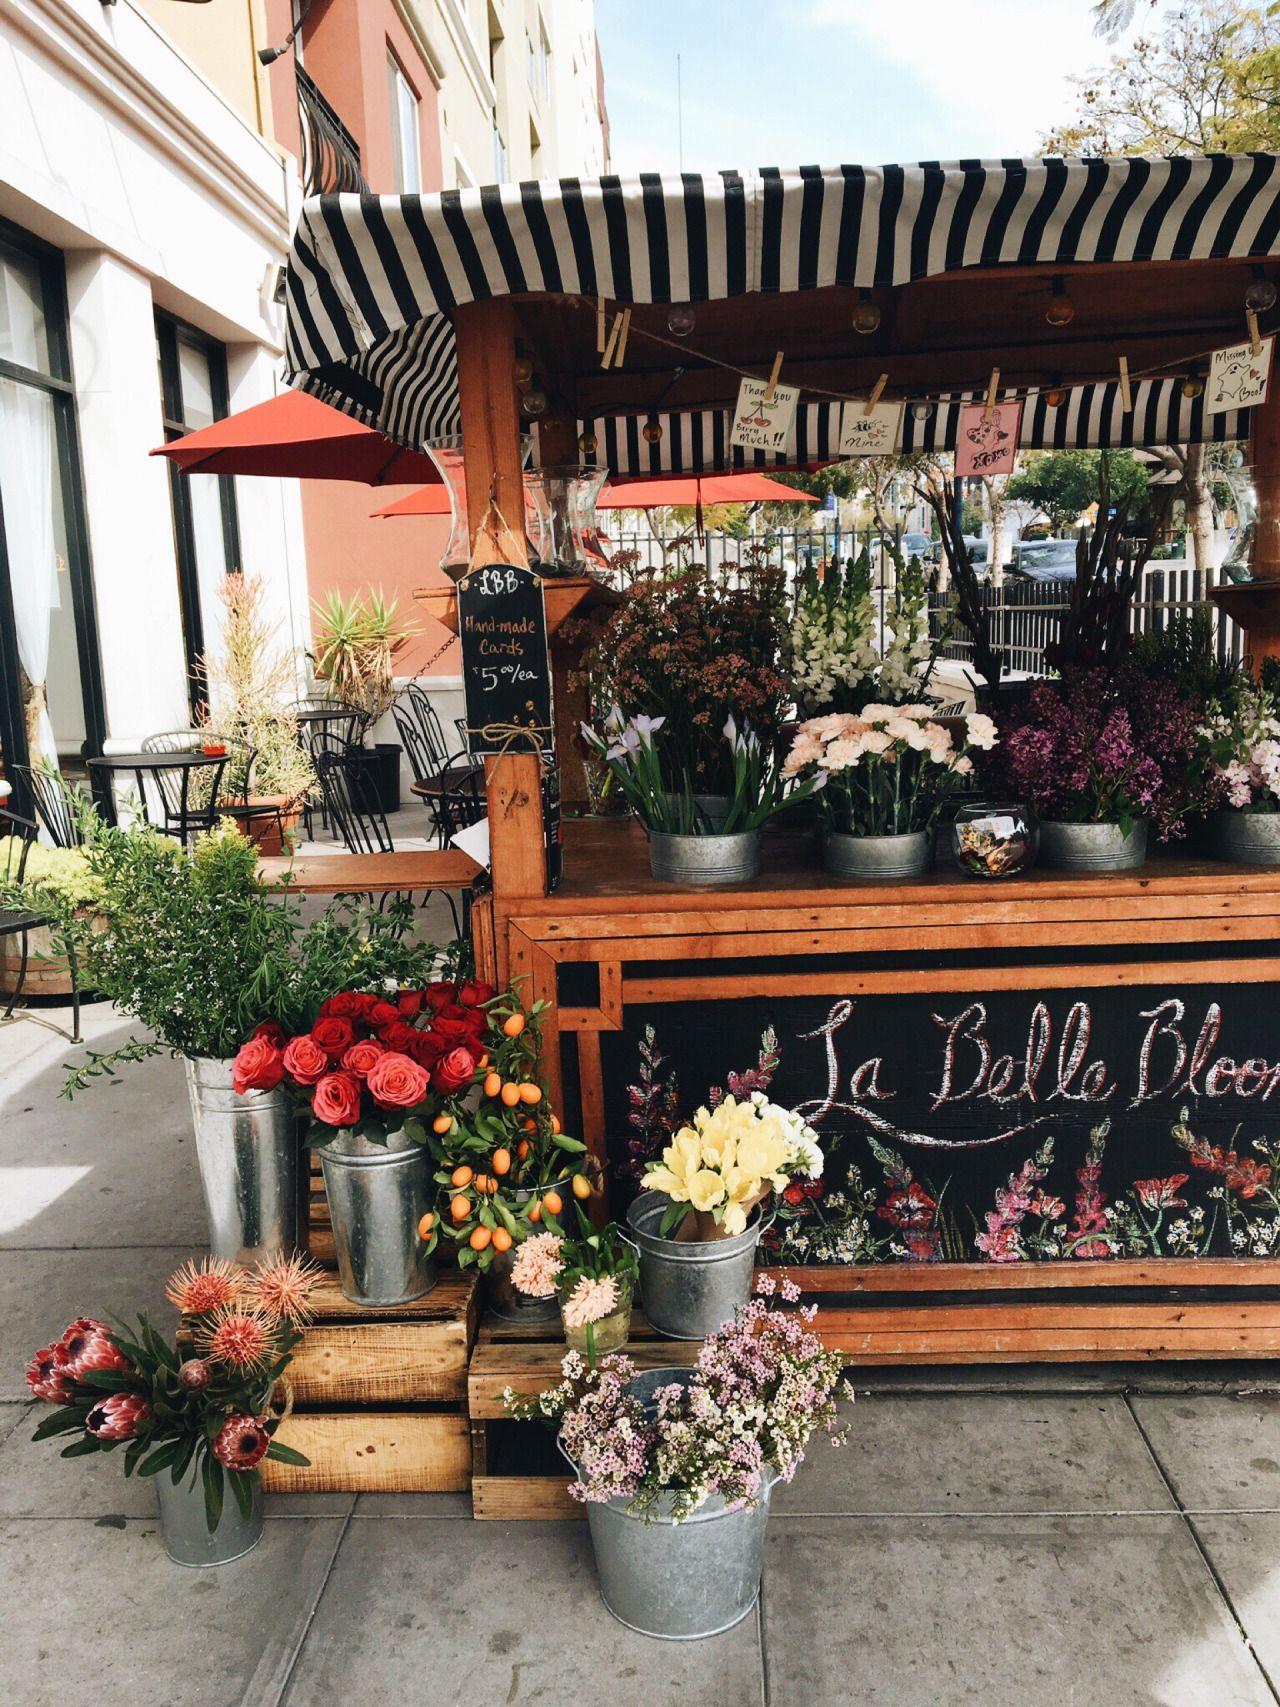 Enjoy Yourself. Live Preppy Flower truck, Farm stand